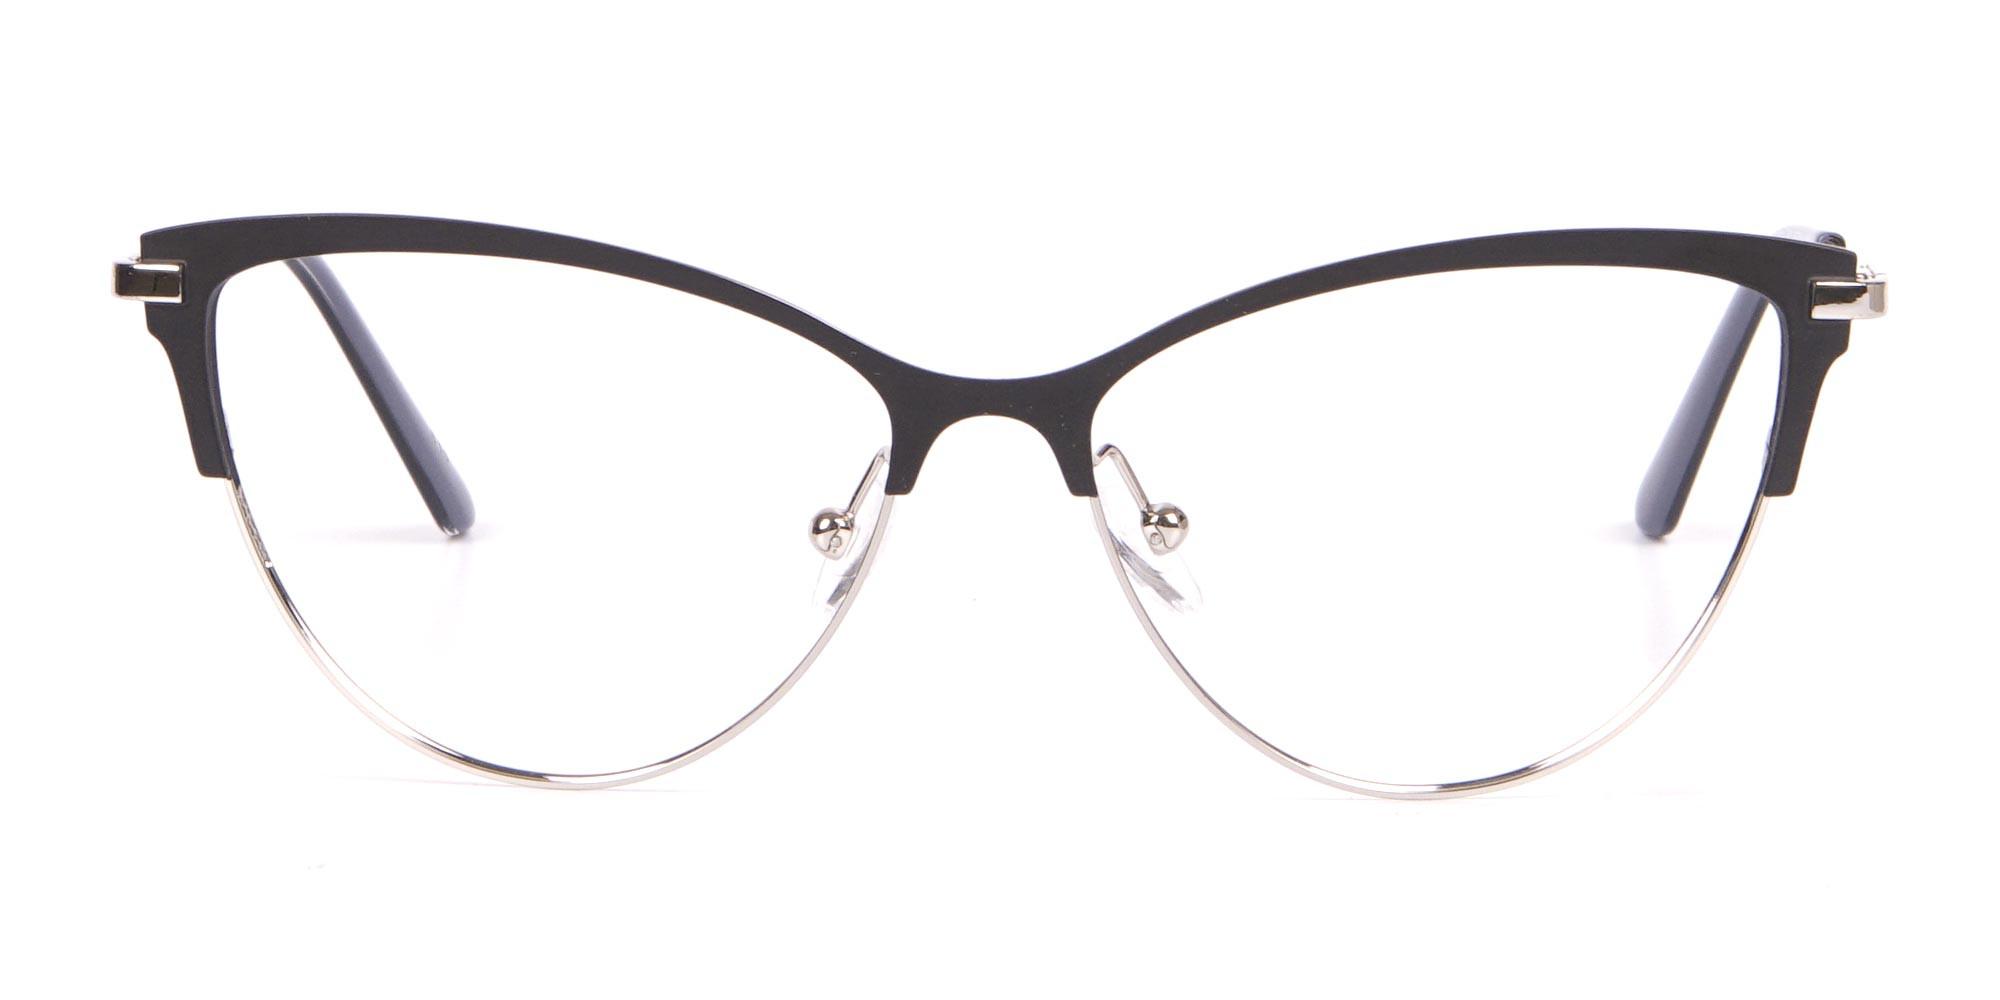 Calvin Klein CK19111 Women's Cat-Eye Browline Glasses Black-1